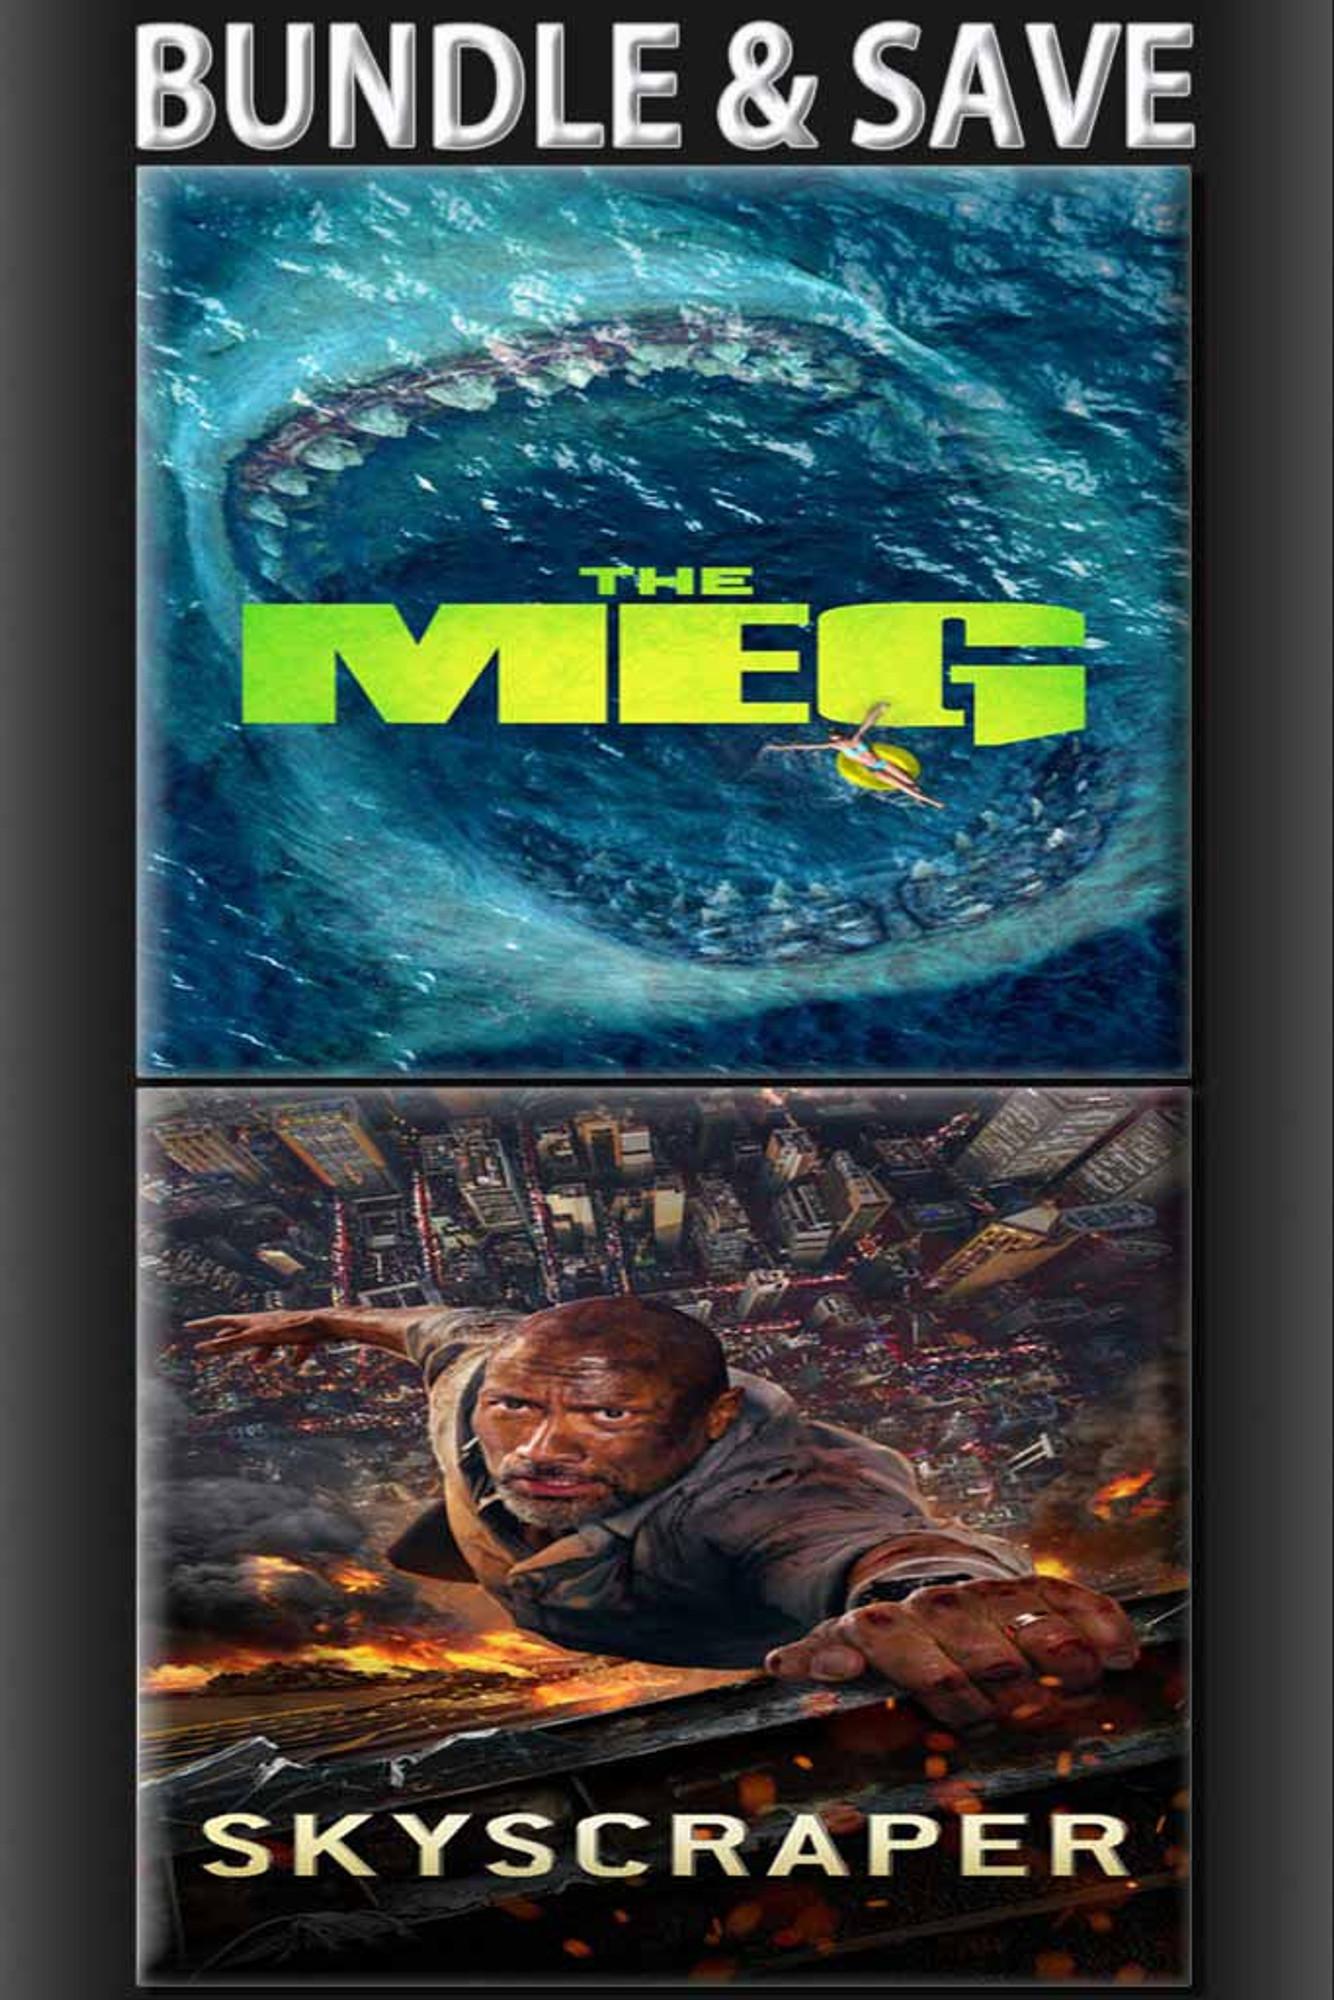 The Meg + Skyscraper Bundle [Movies Anywhere, Vudu or iTunes via Movies  Anywhere]